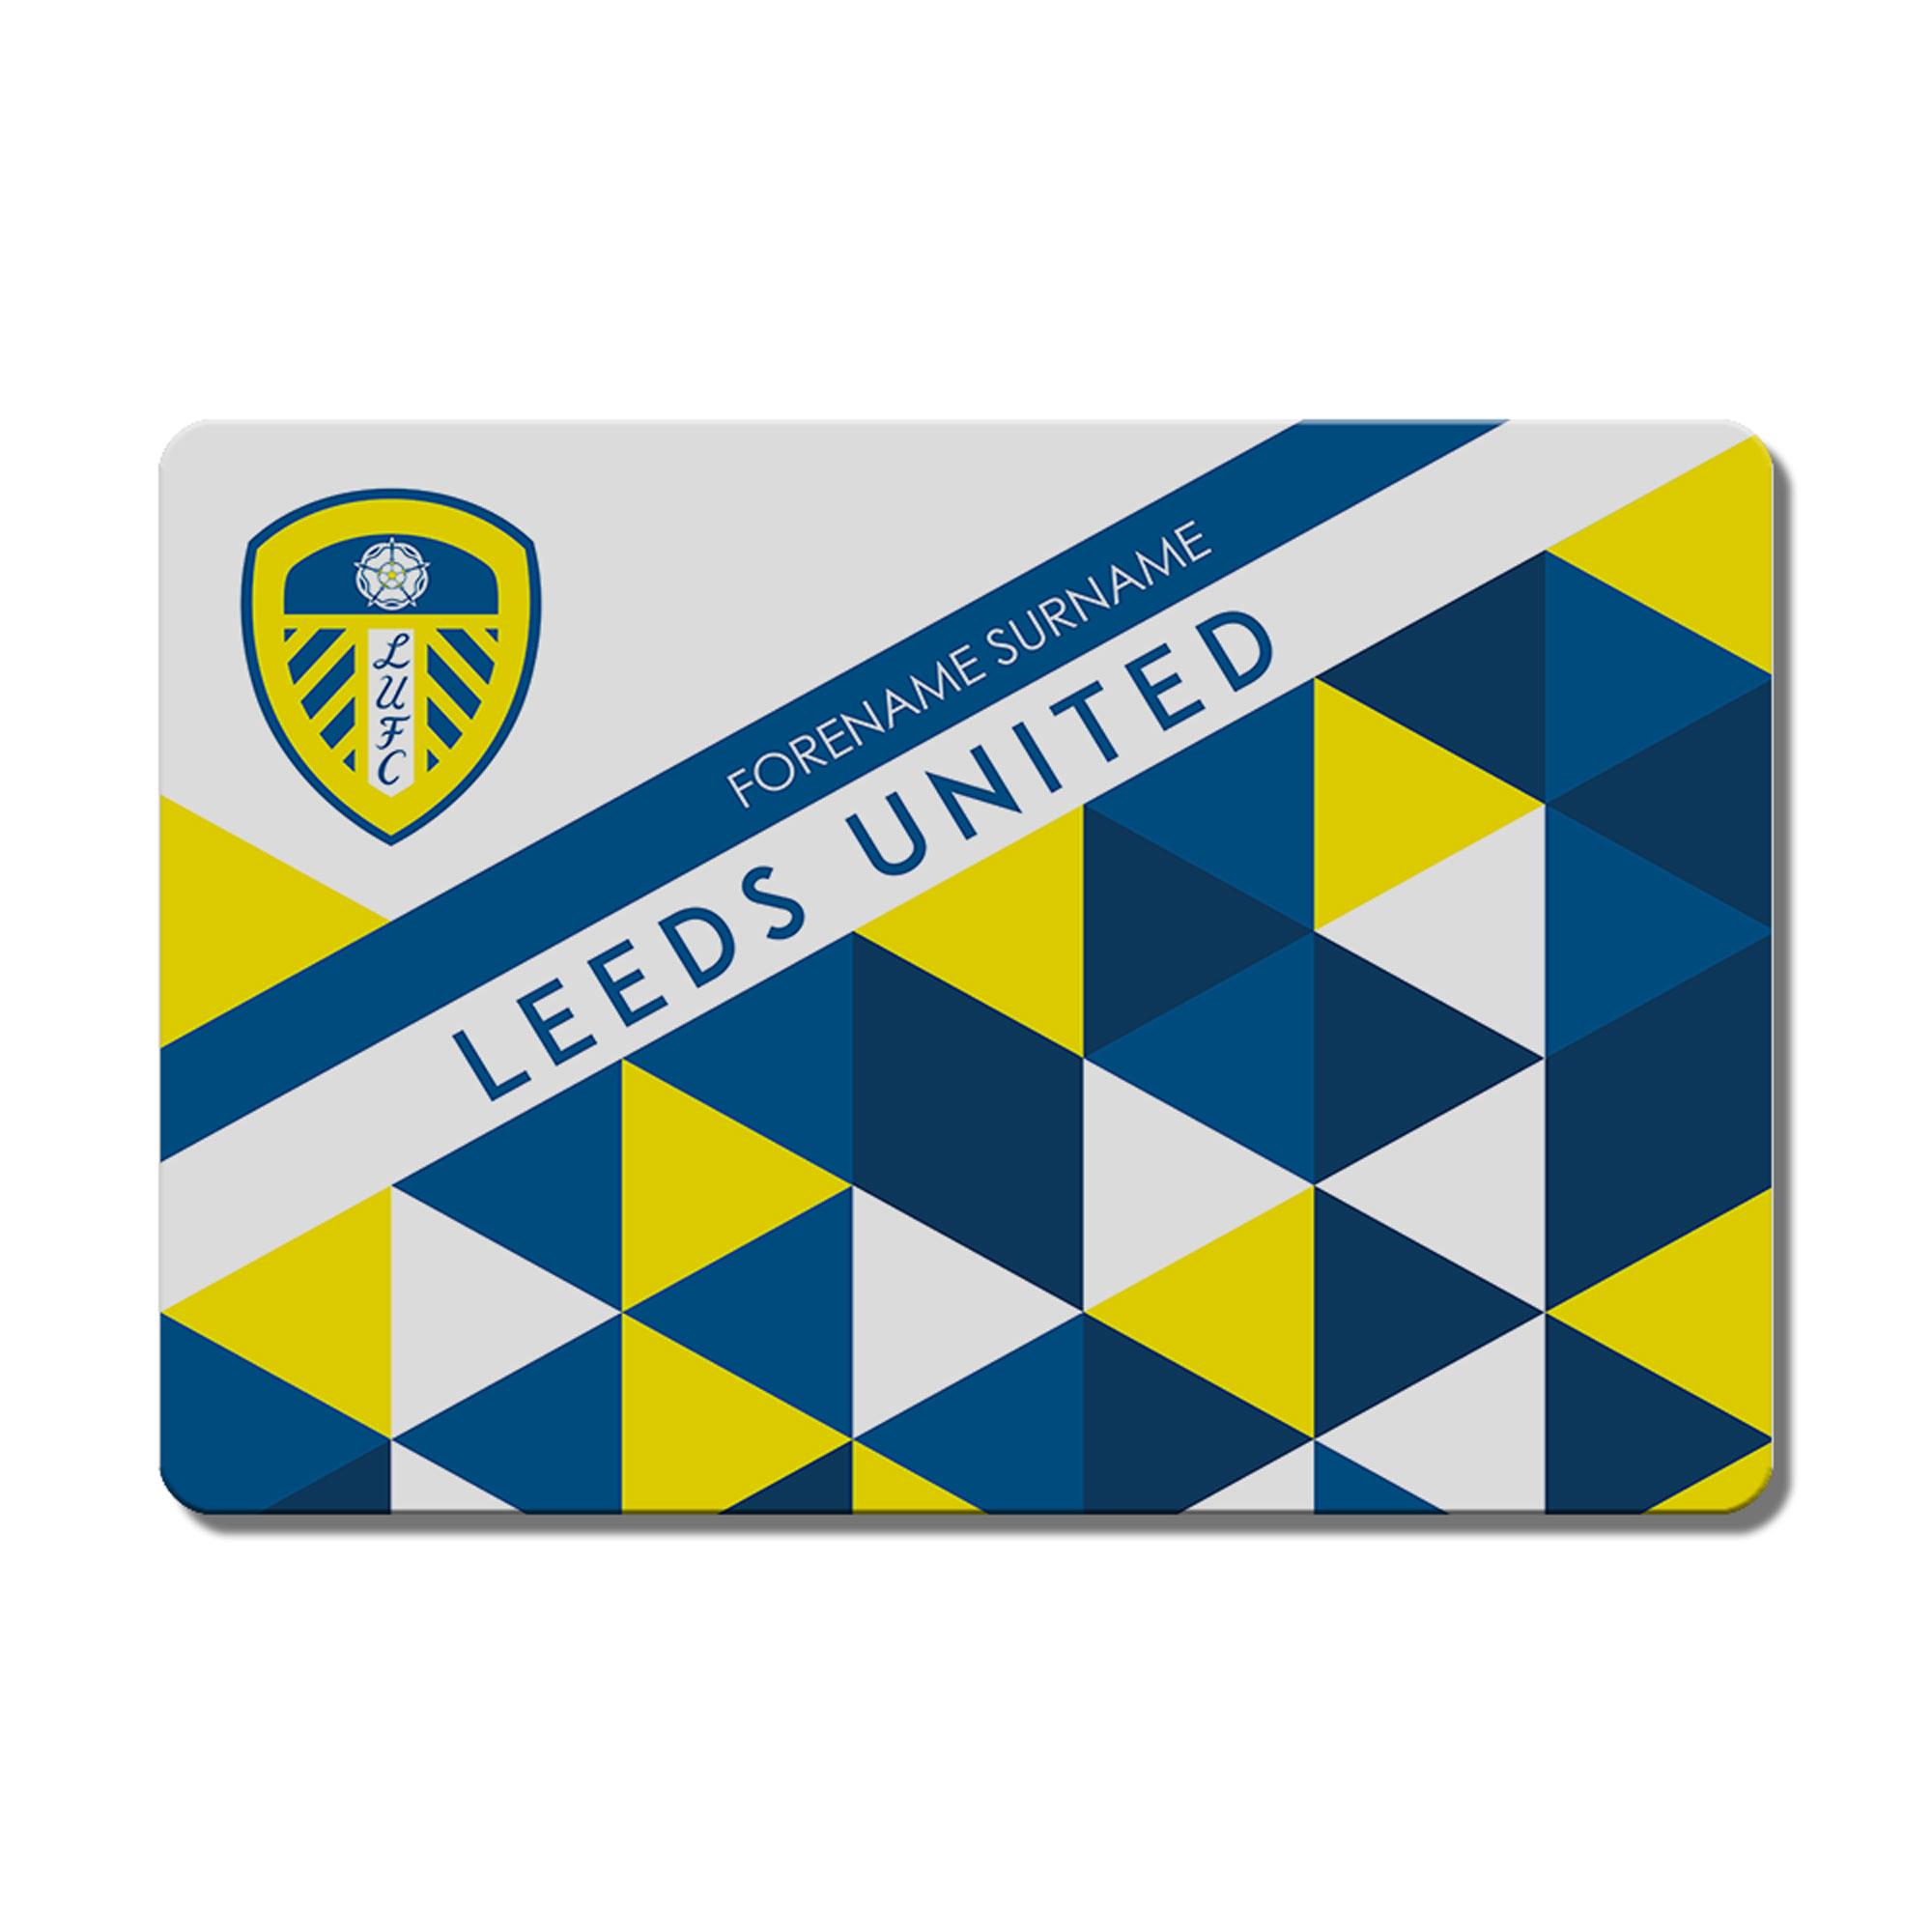 Leeds United FC Patterned Floor Mat